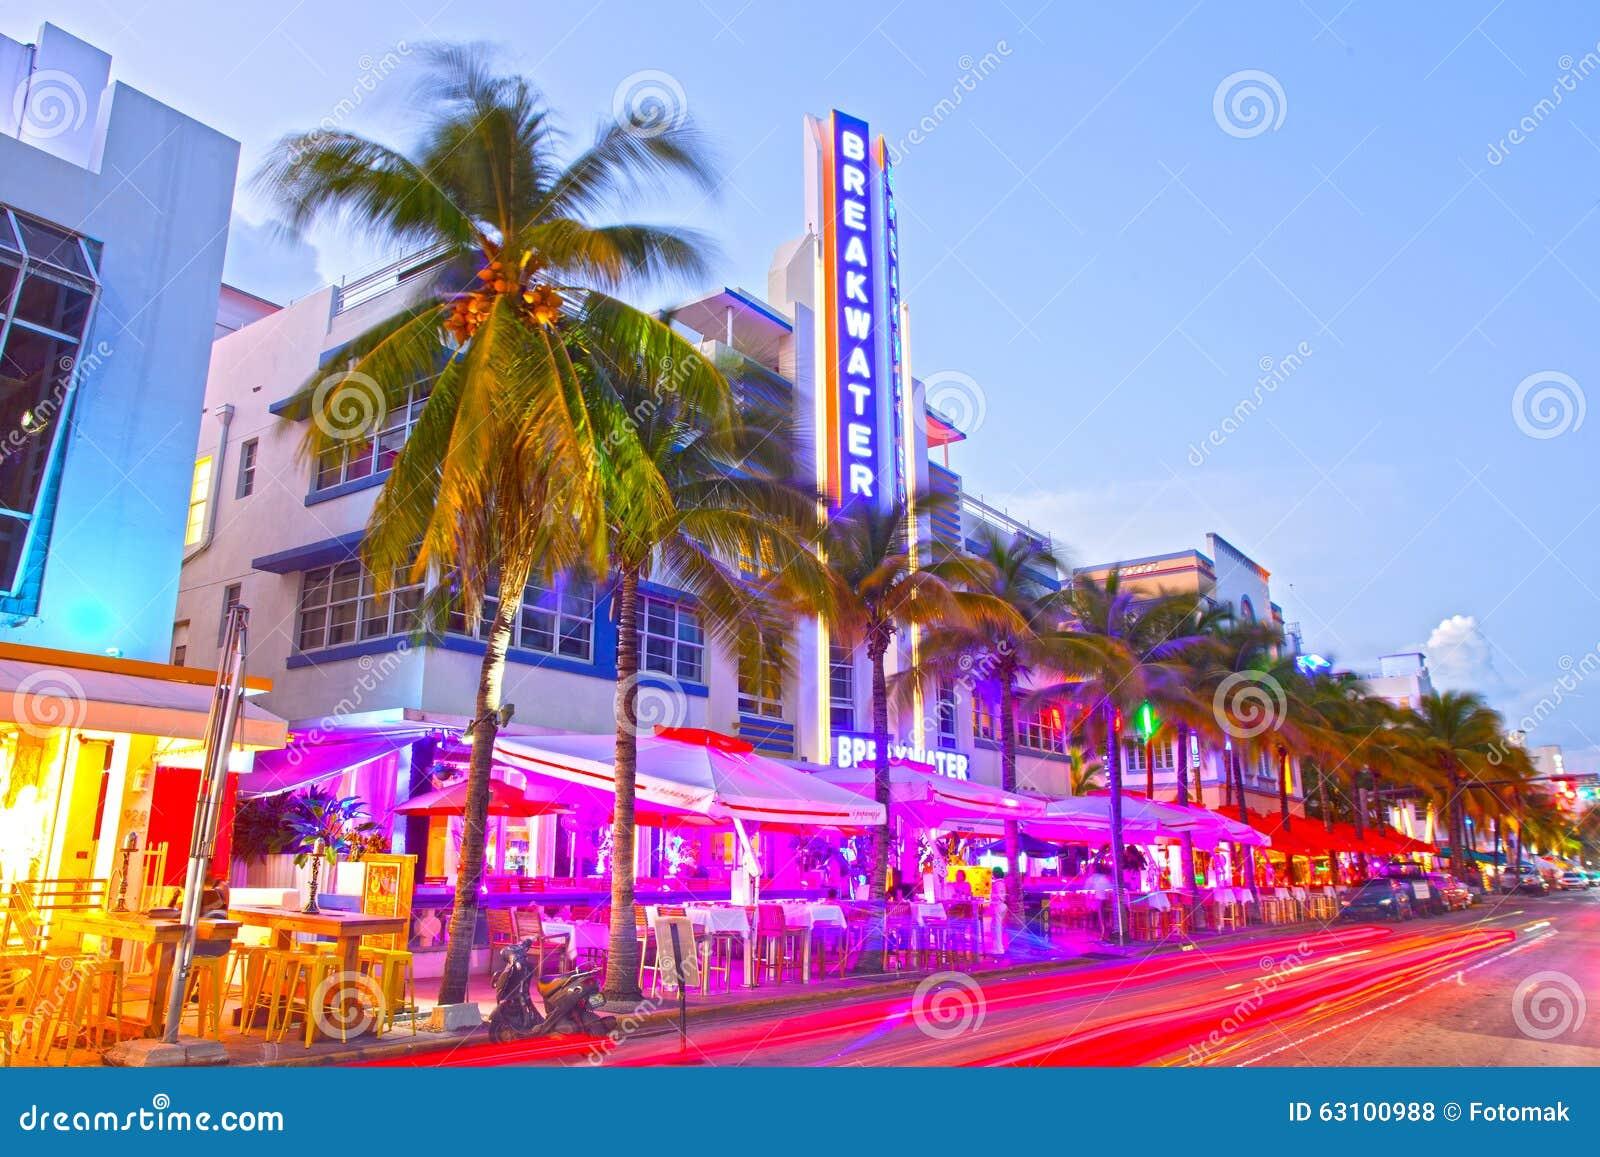 Famous Restaurants In Miami Beach